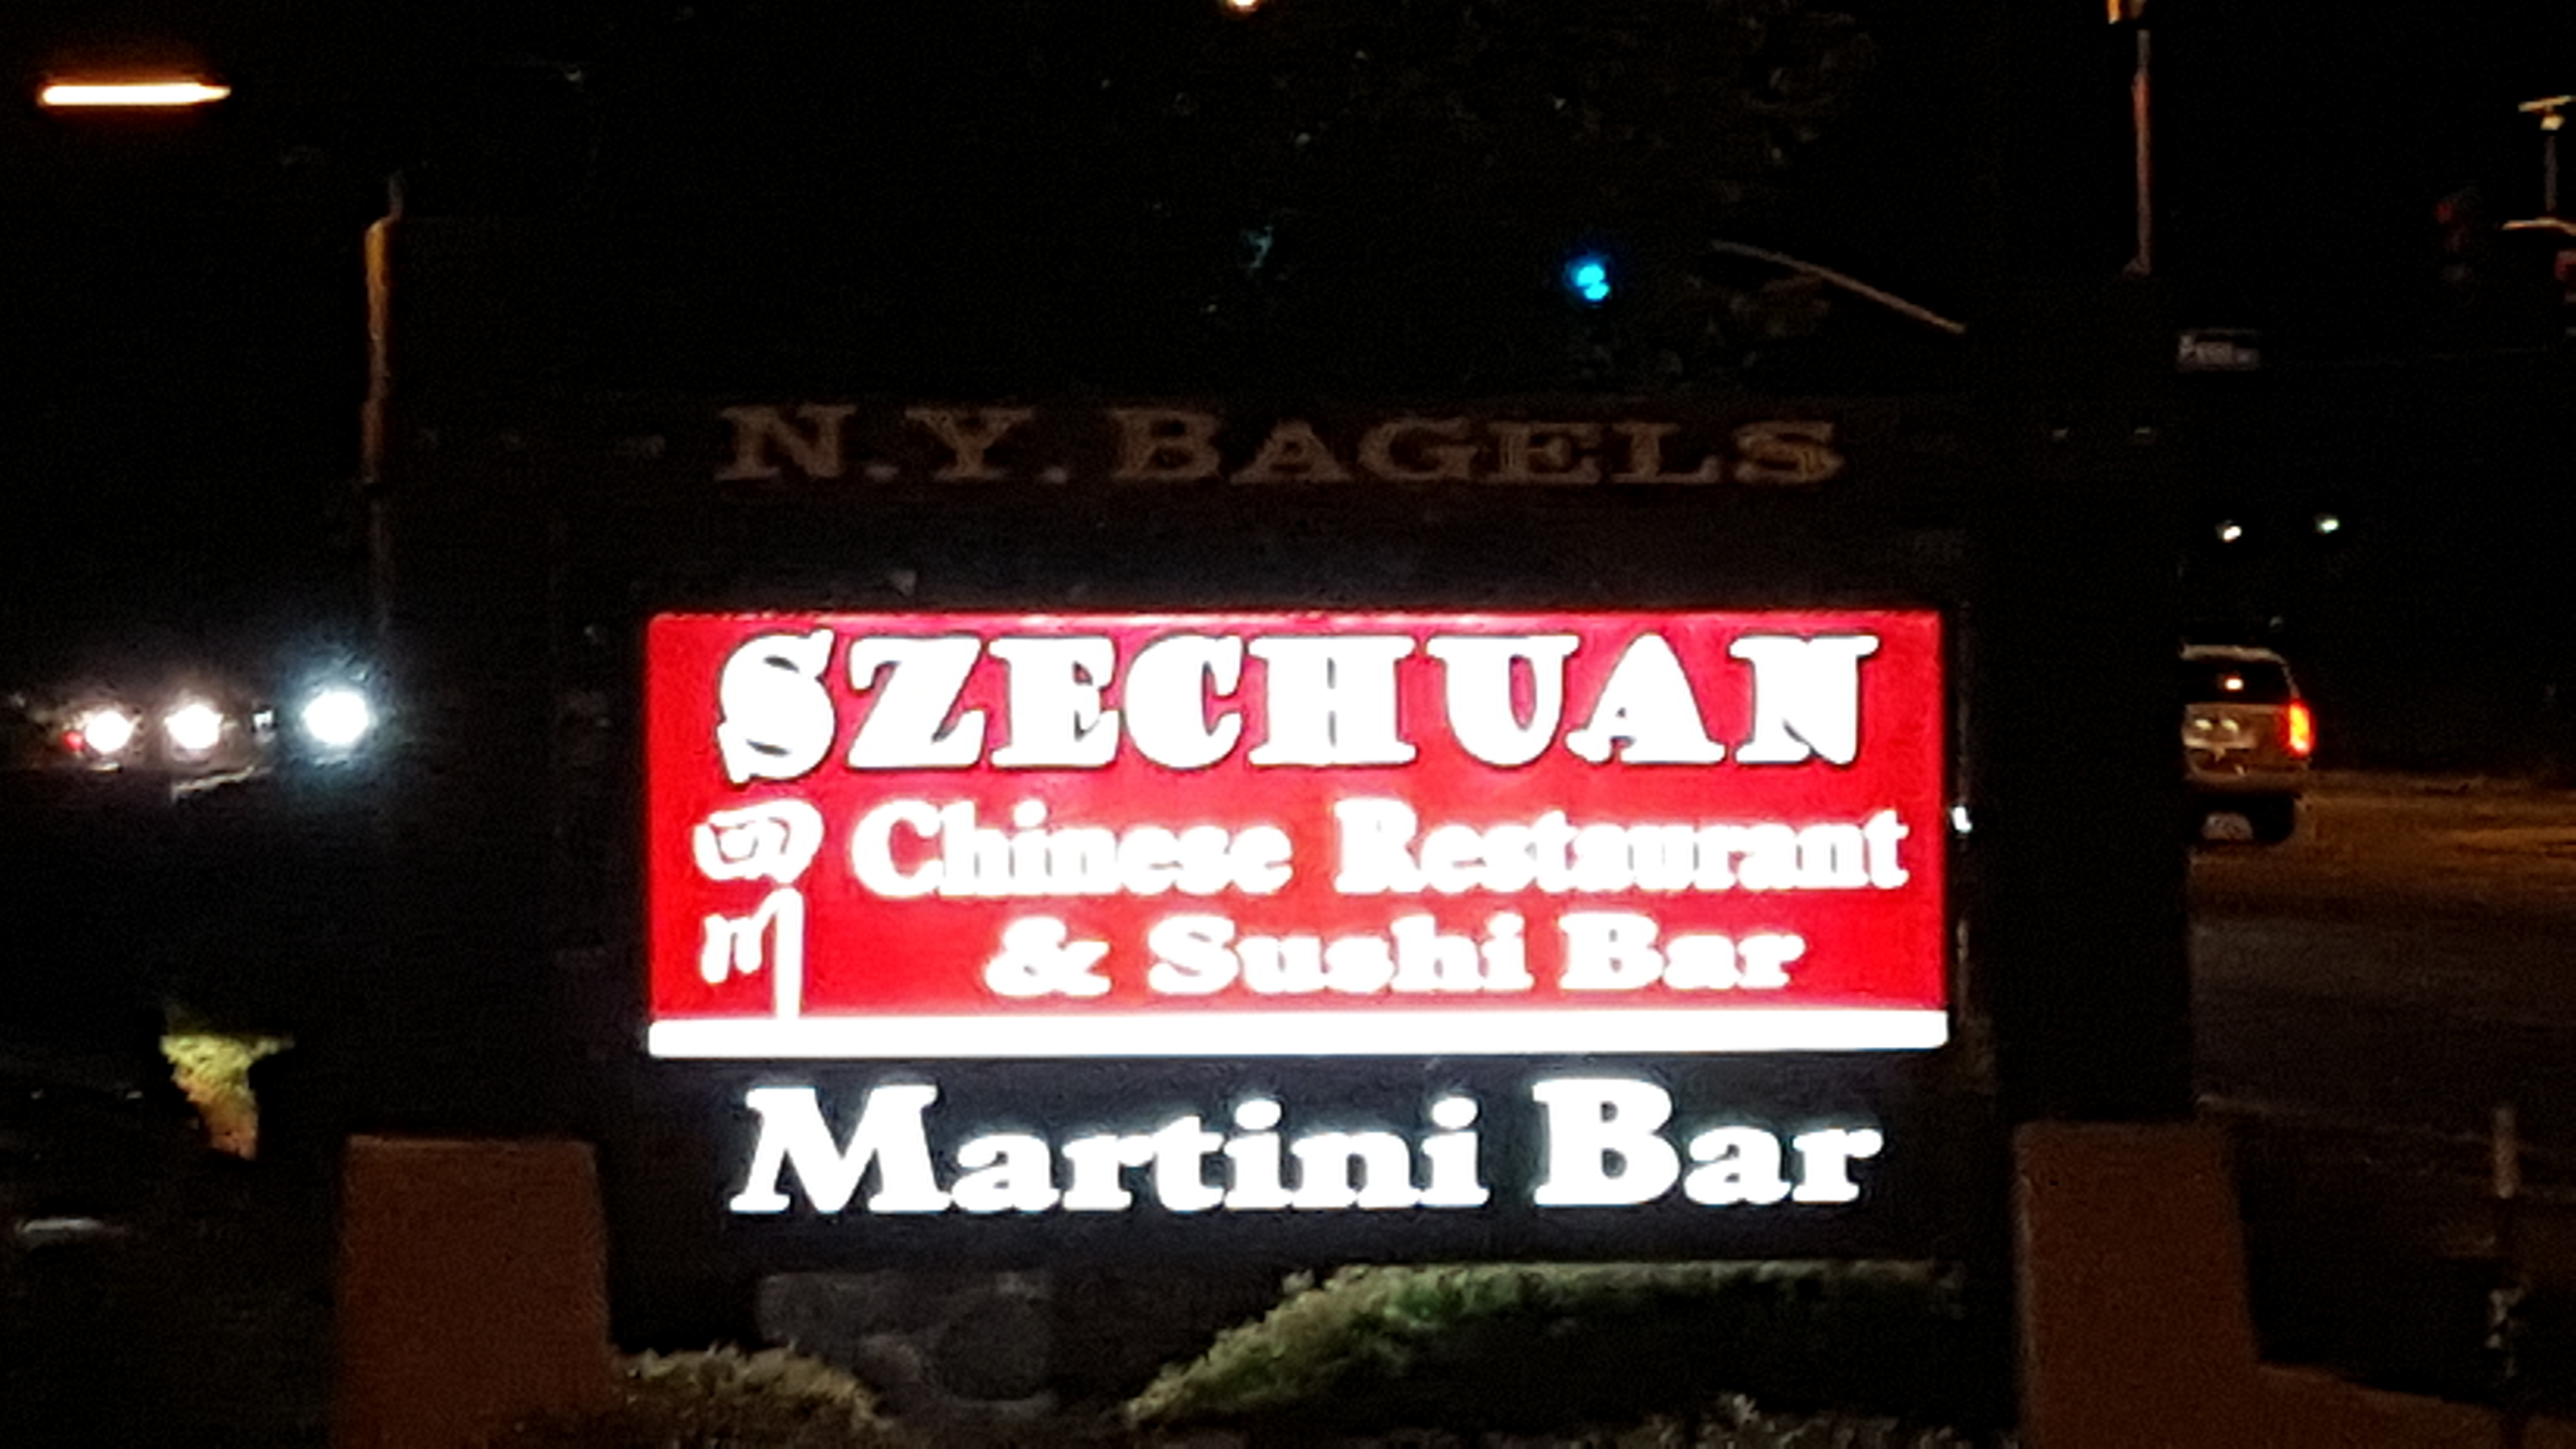 Szechuan Restaurant In Sedona Az